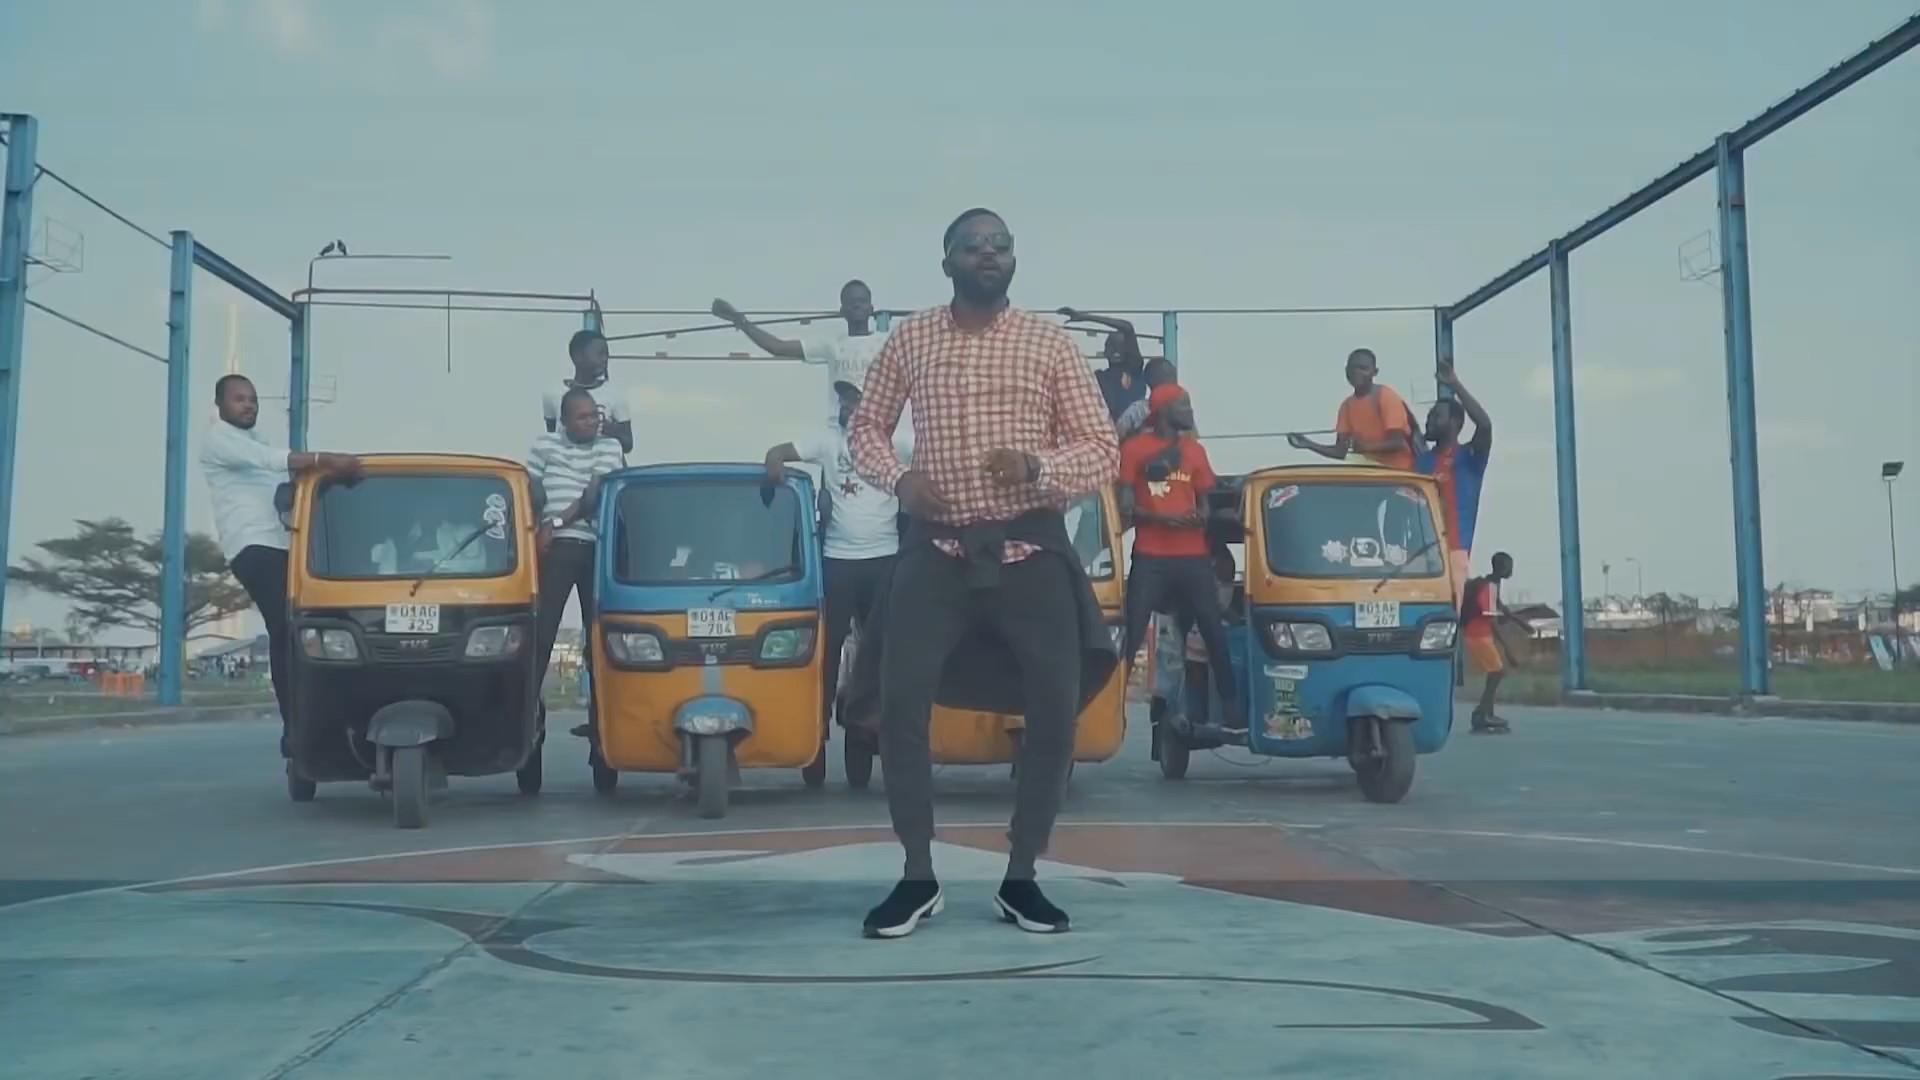 Olivier kalabasi generique fan zone clip officiel hd 4k mp4 snapshot 02 17 880